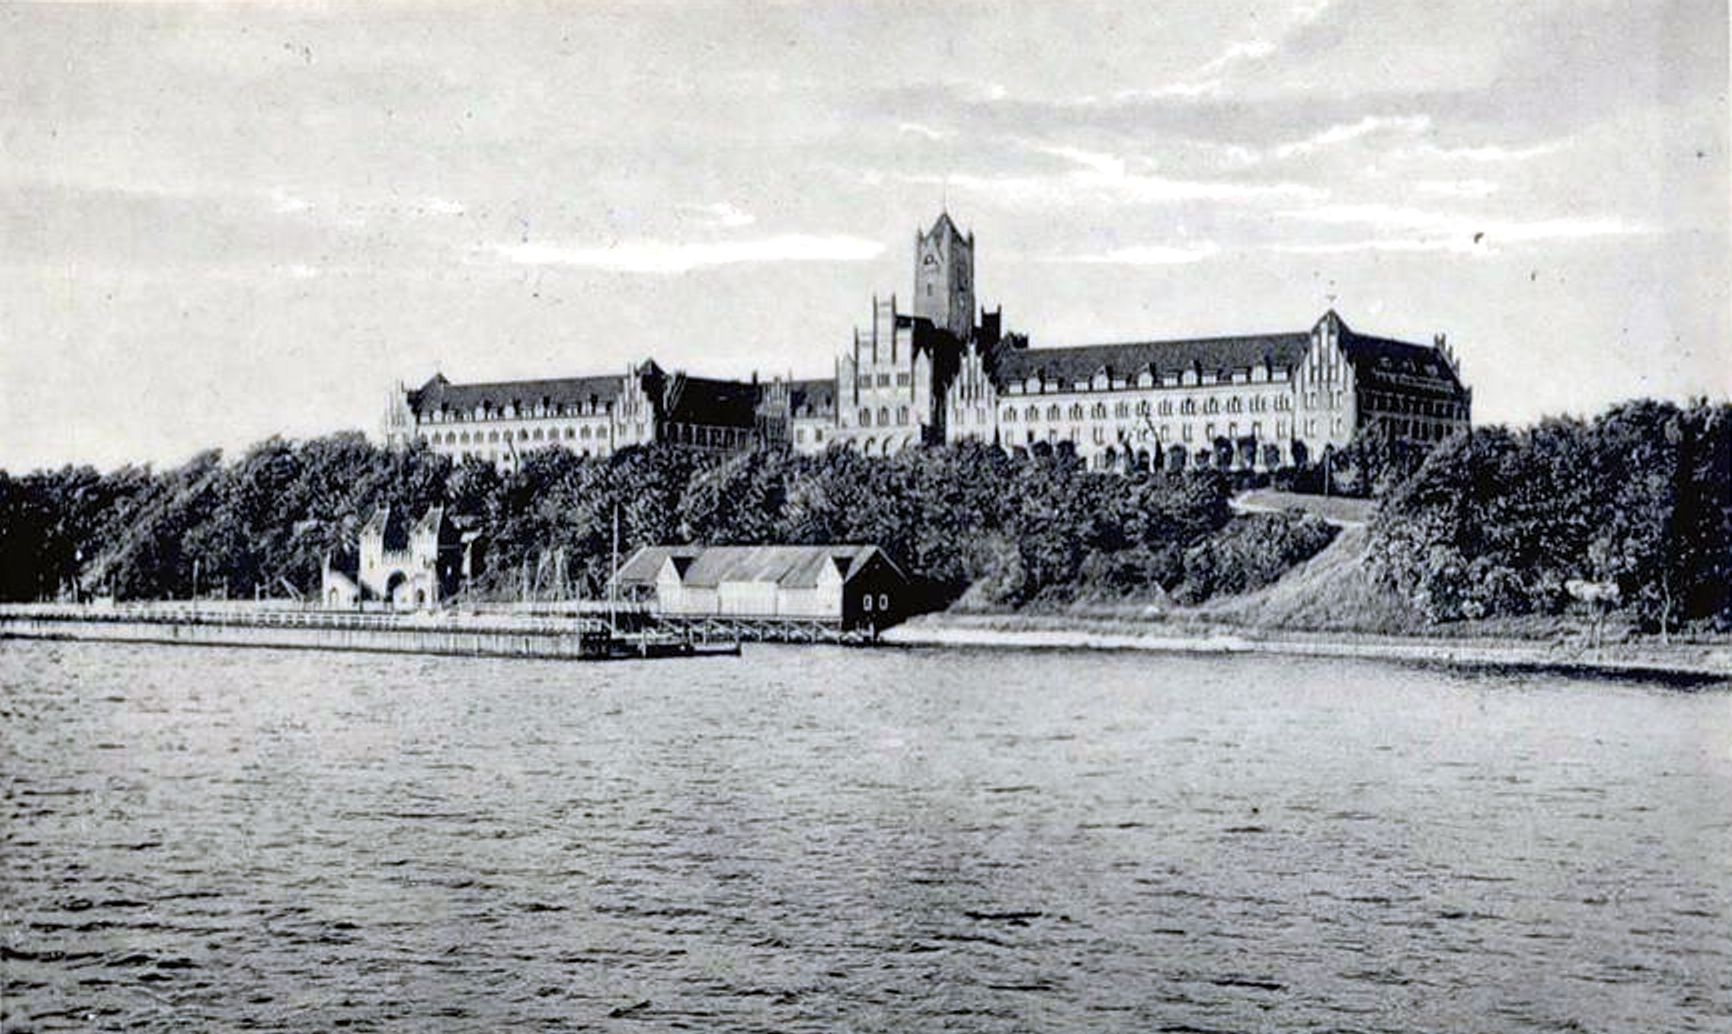 https://i2.wp.com/de.metapedia.org/m/images/7/7d/Marineschule_Flensburg-M%C3%BCrwik.jpg